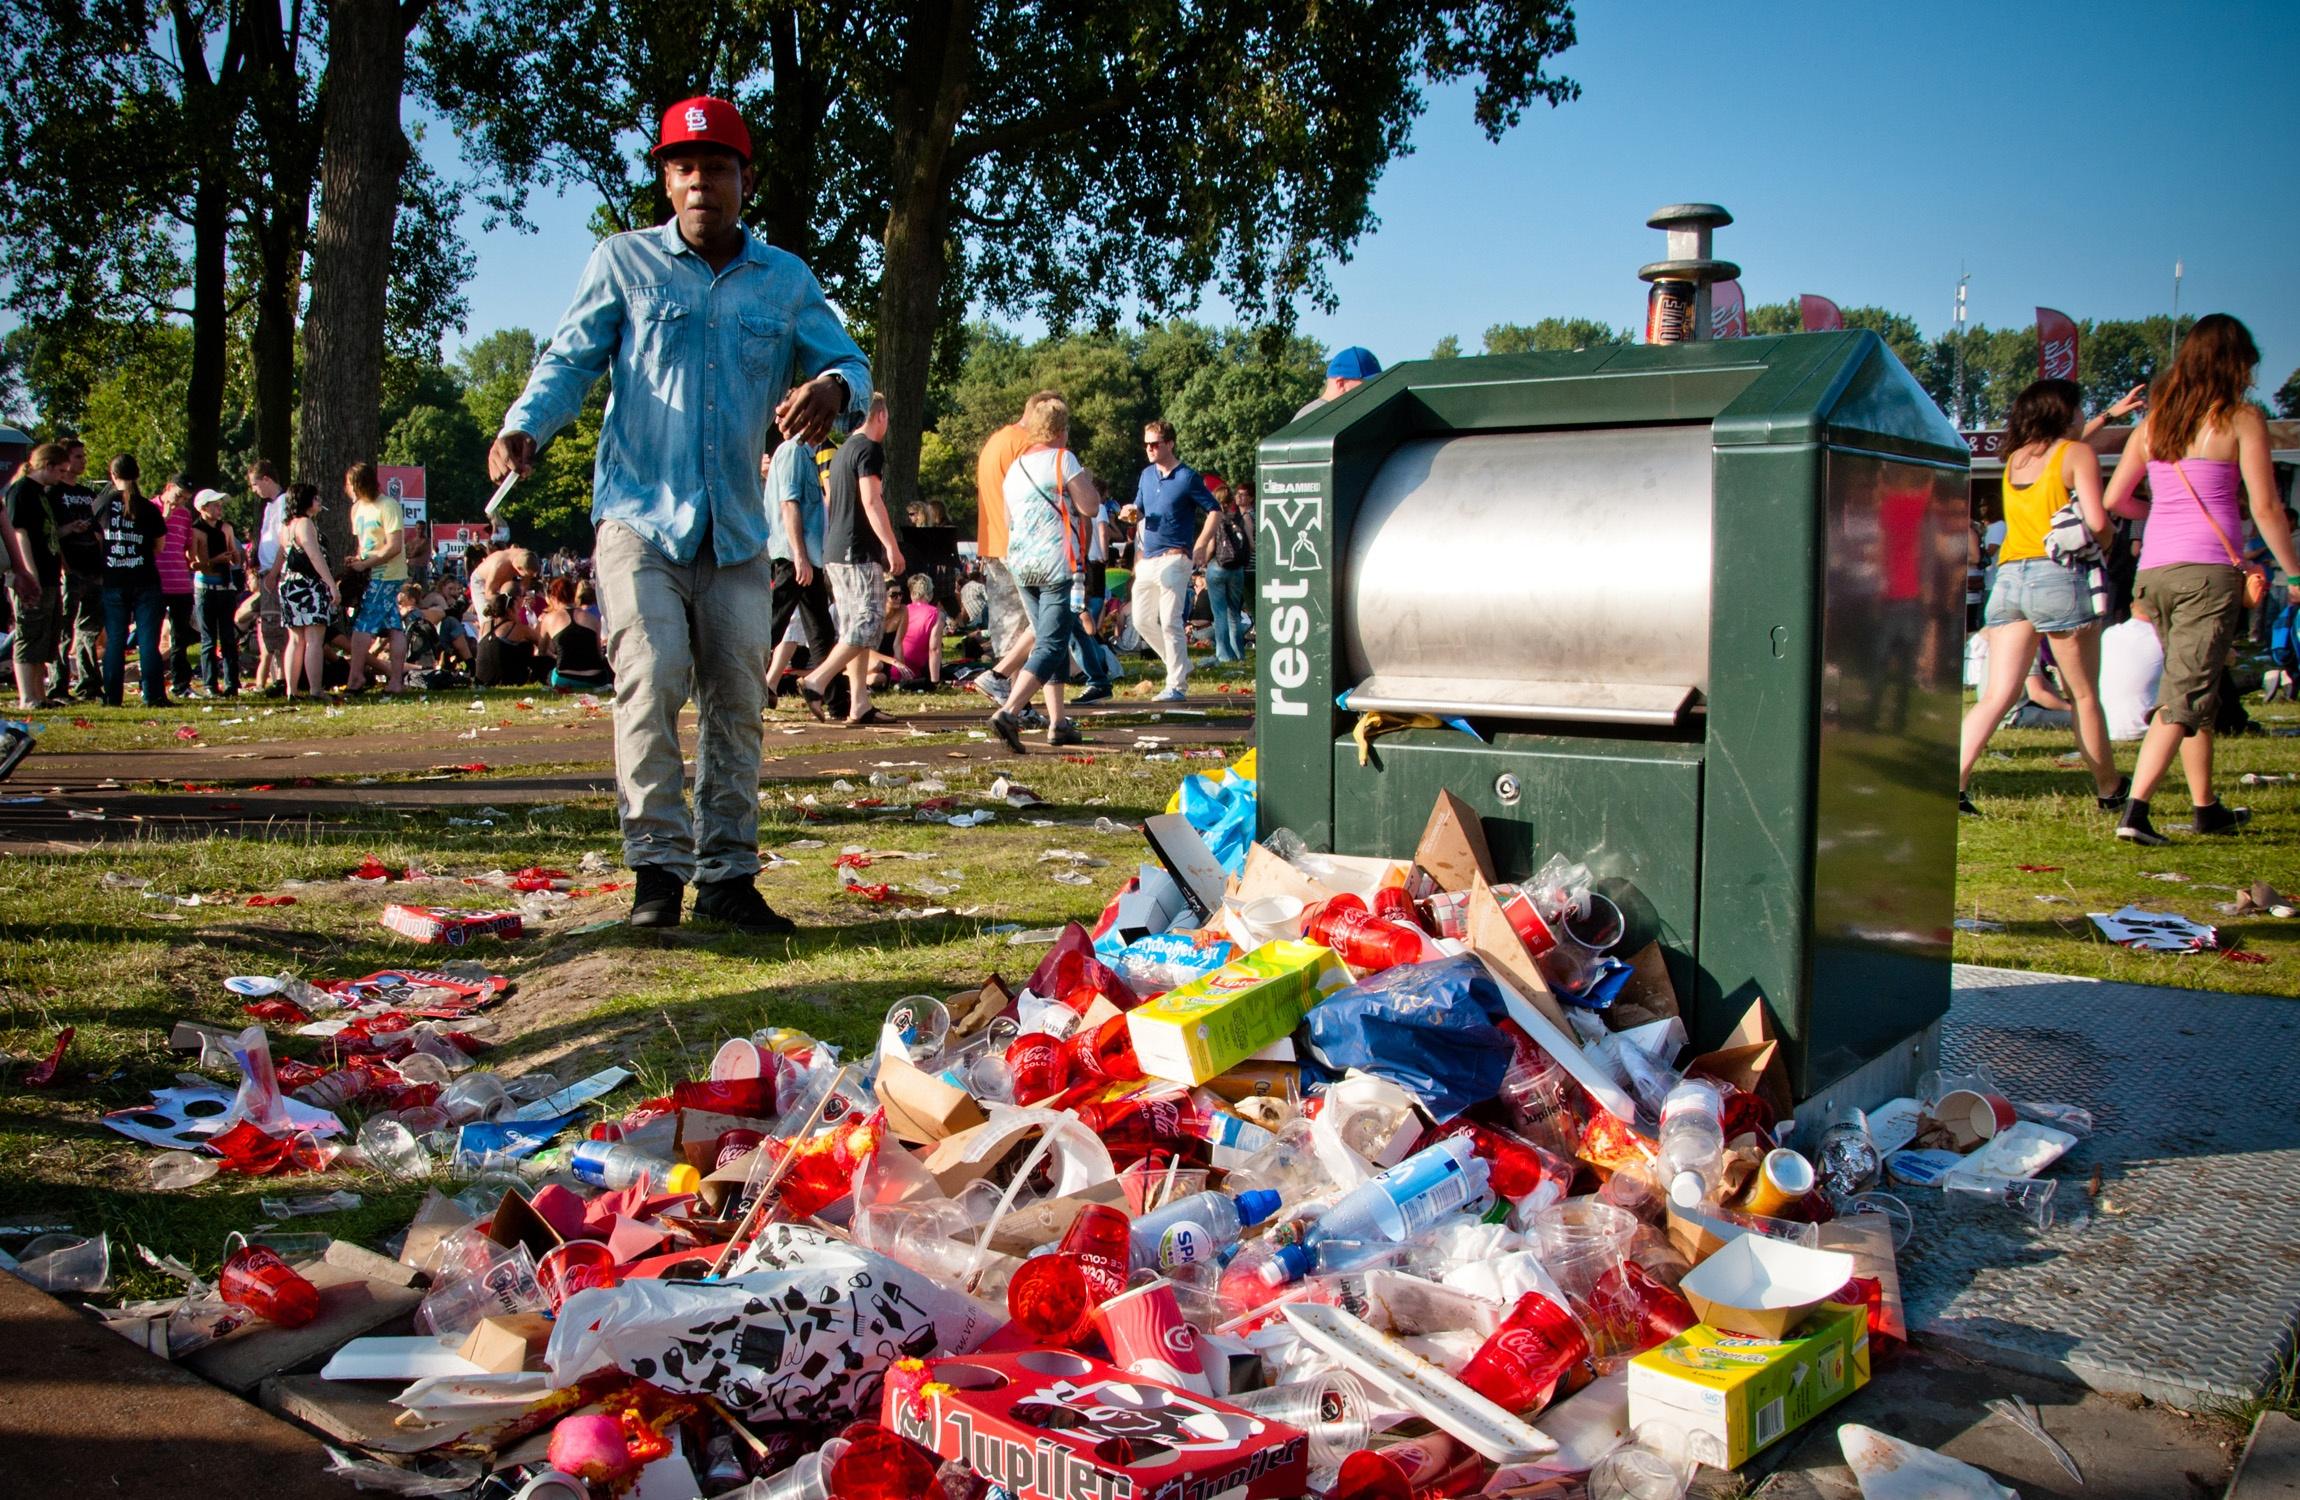 stockvault-full-trashcan132433